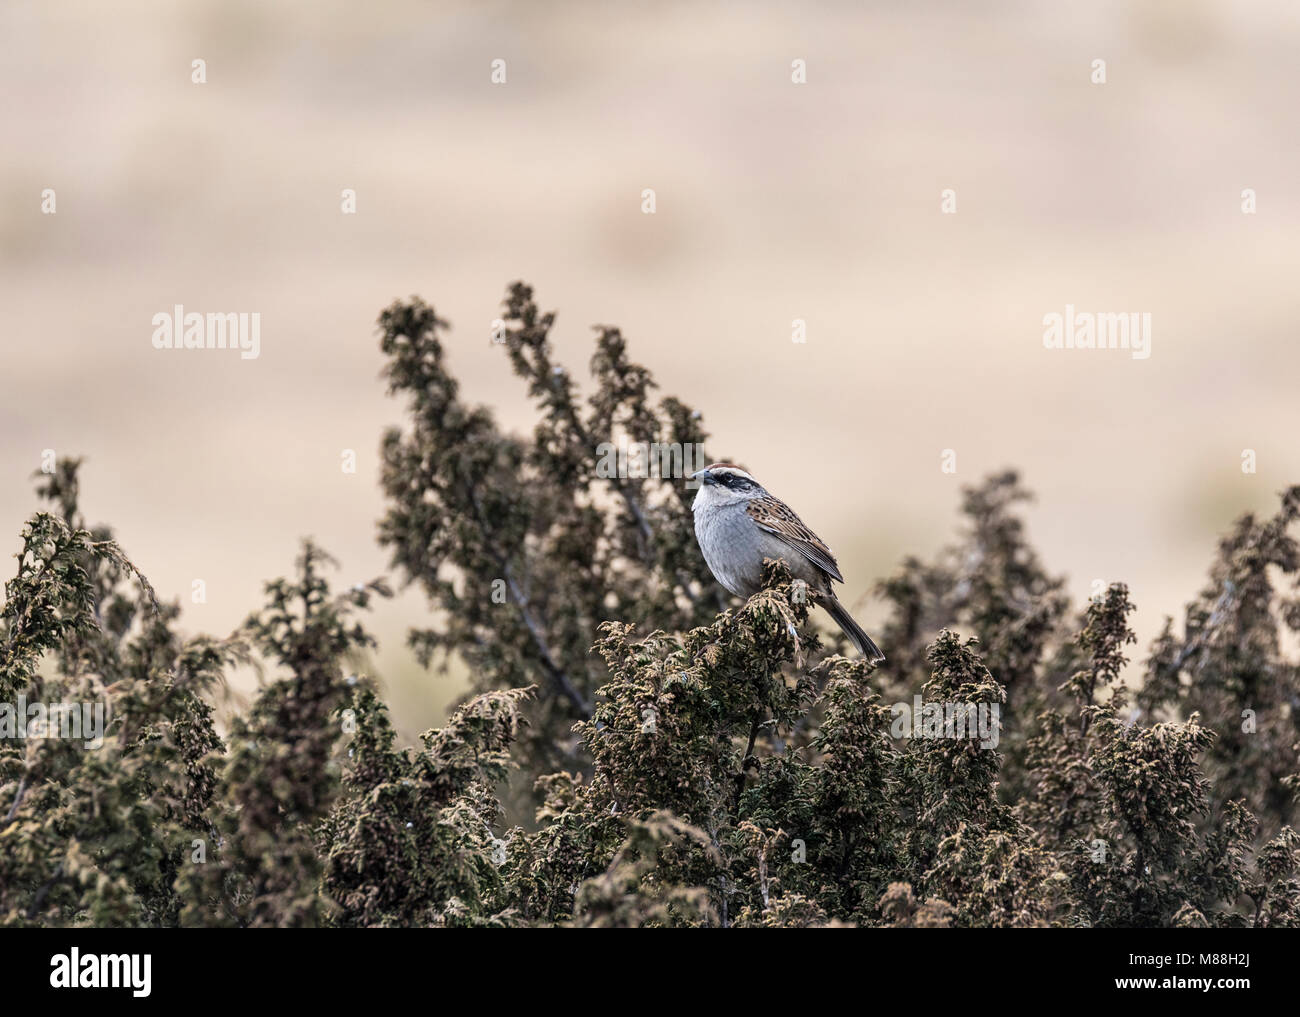 A Striped Sparrow (Oriturus superciliosus) sitting on a bush - Stock Image